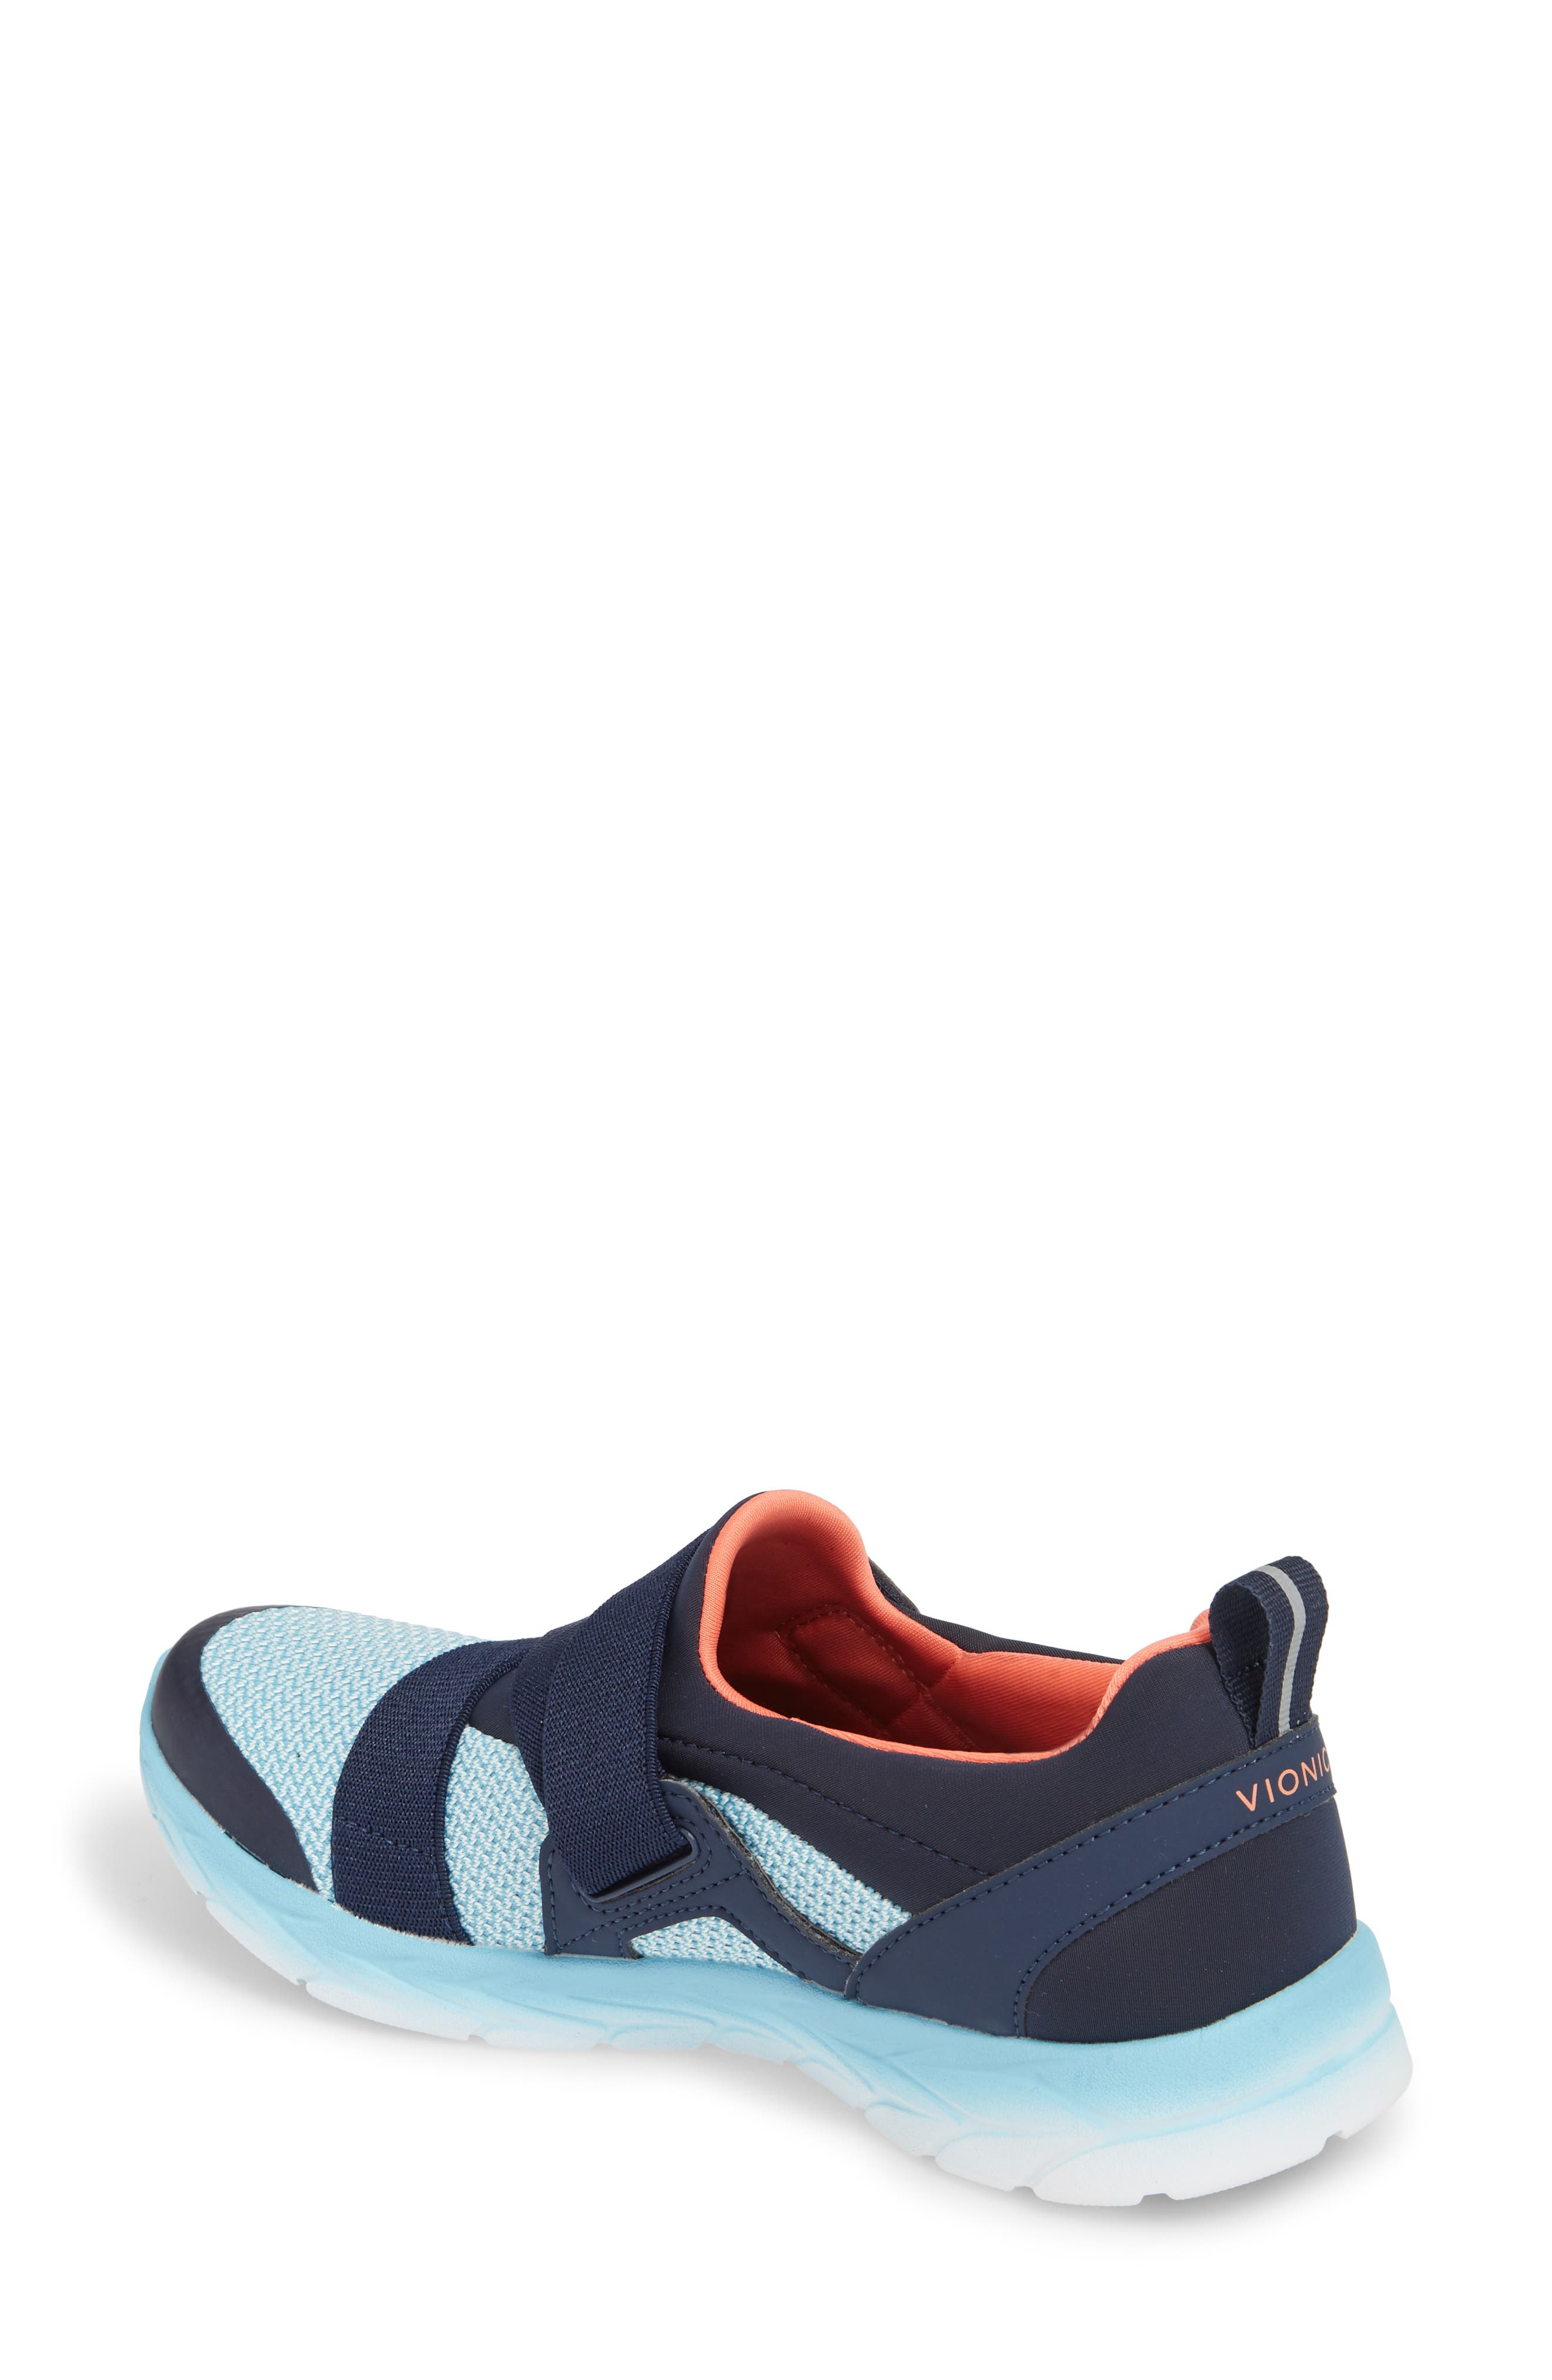 Dash Sneaker,                             Alternate thumbnail 2, color,                             Navy/ Light Blue Fabric